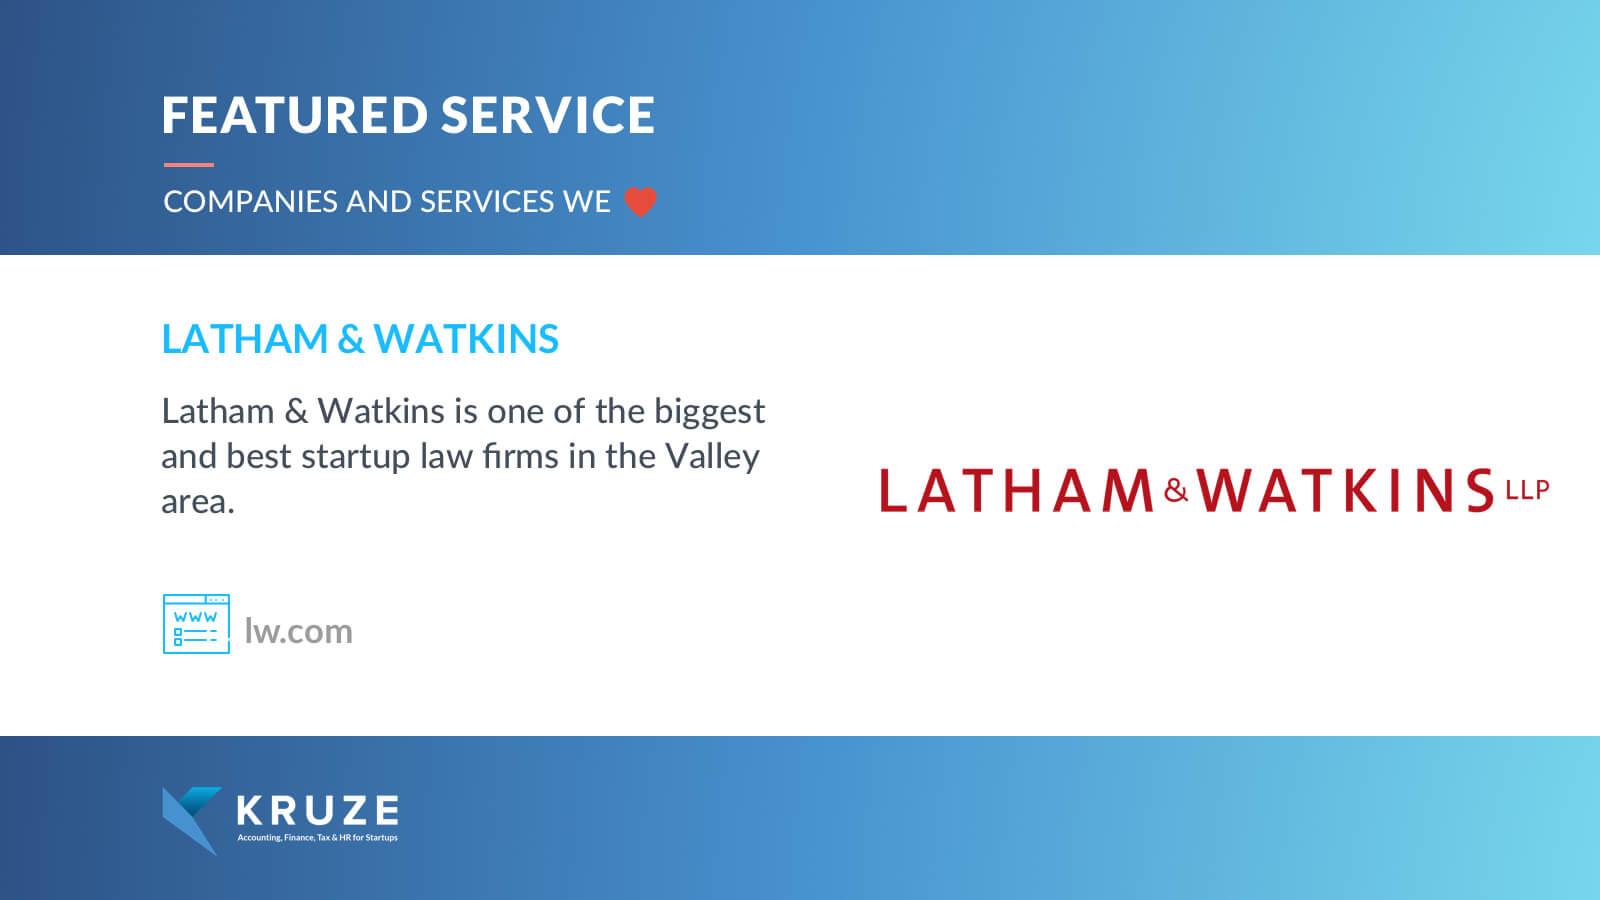 Featured Service - Latham & Watkins